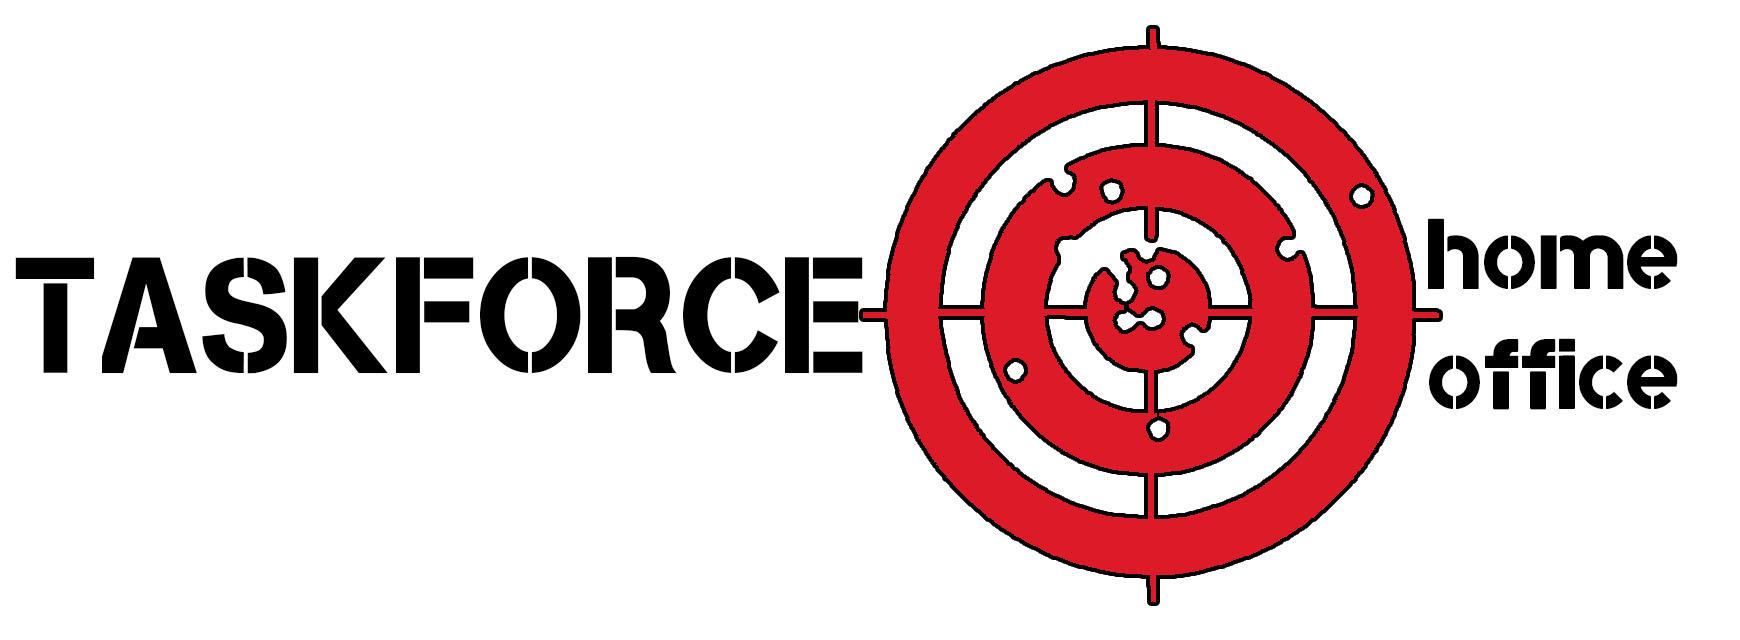 Taskforce Homeoffice